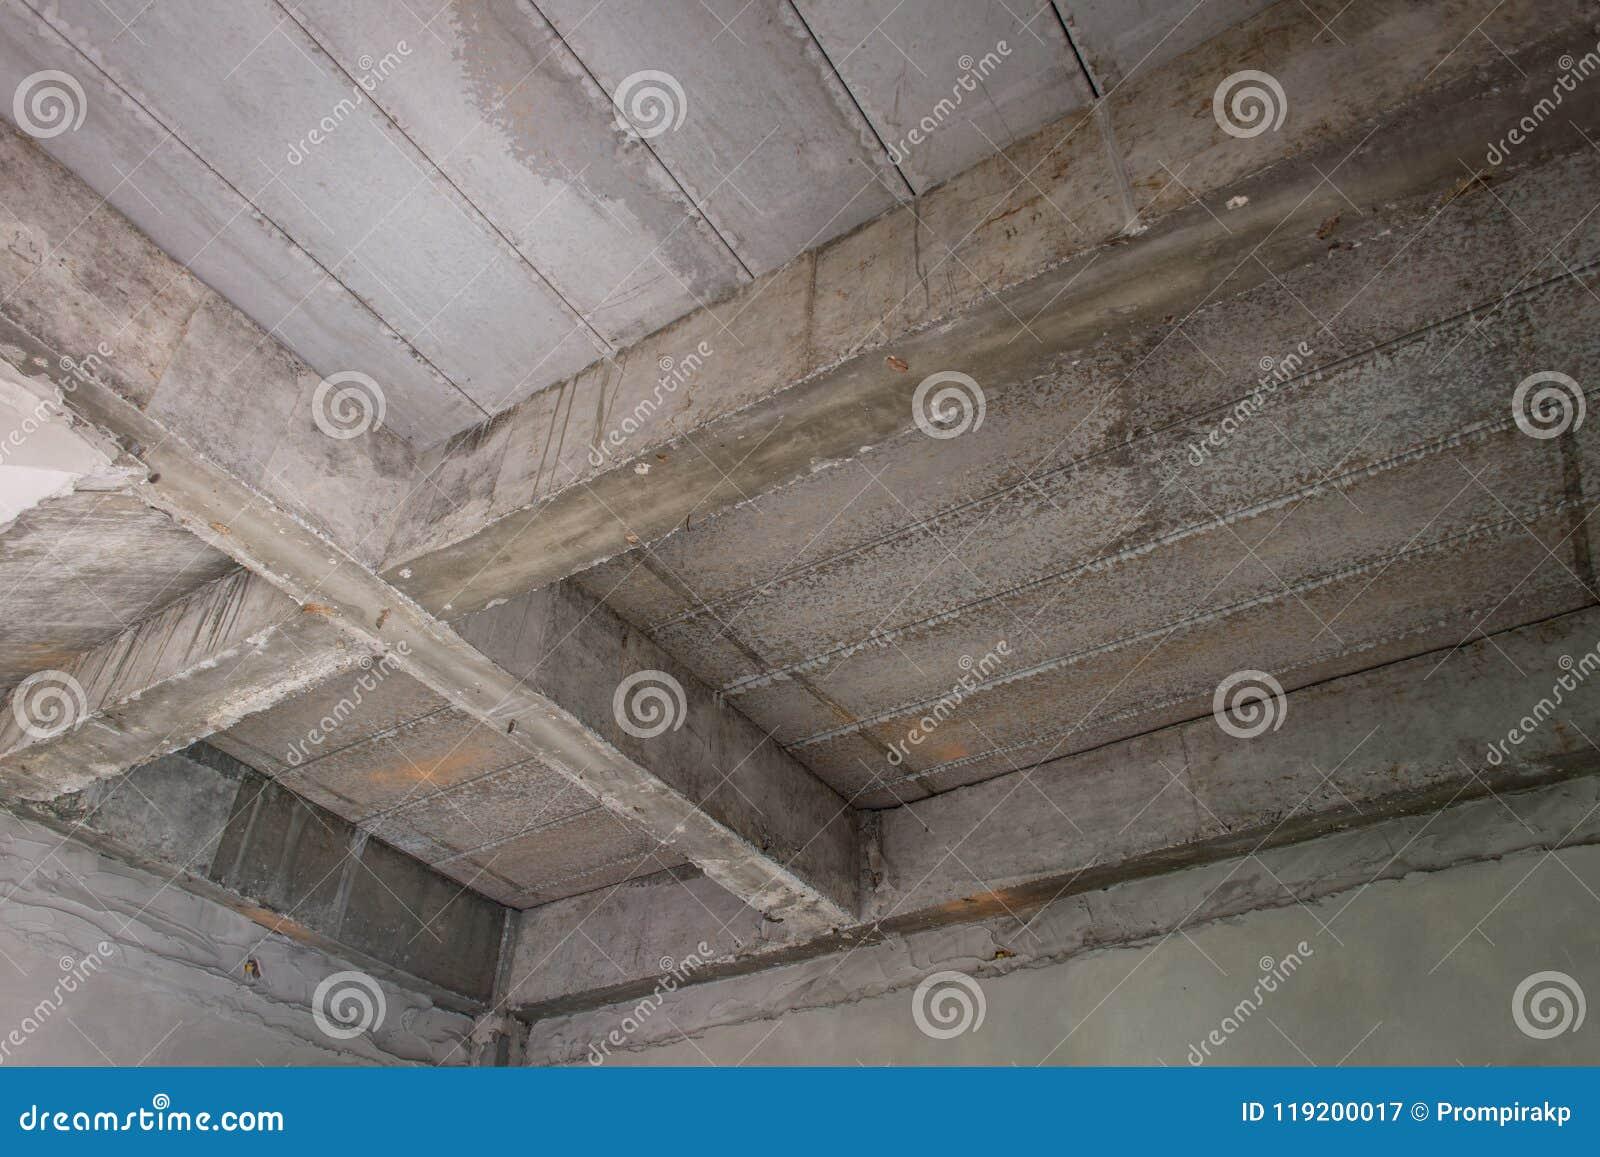 Unfertiger Innenraum des Hauses im Bau an der Baustelle